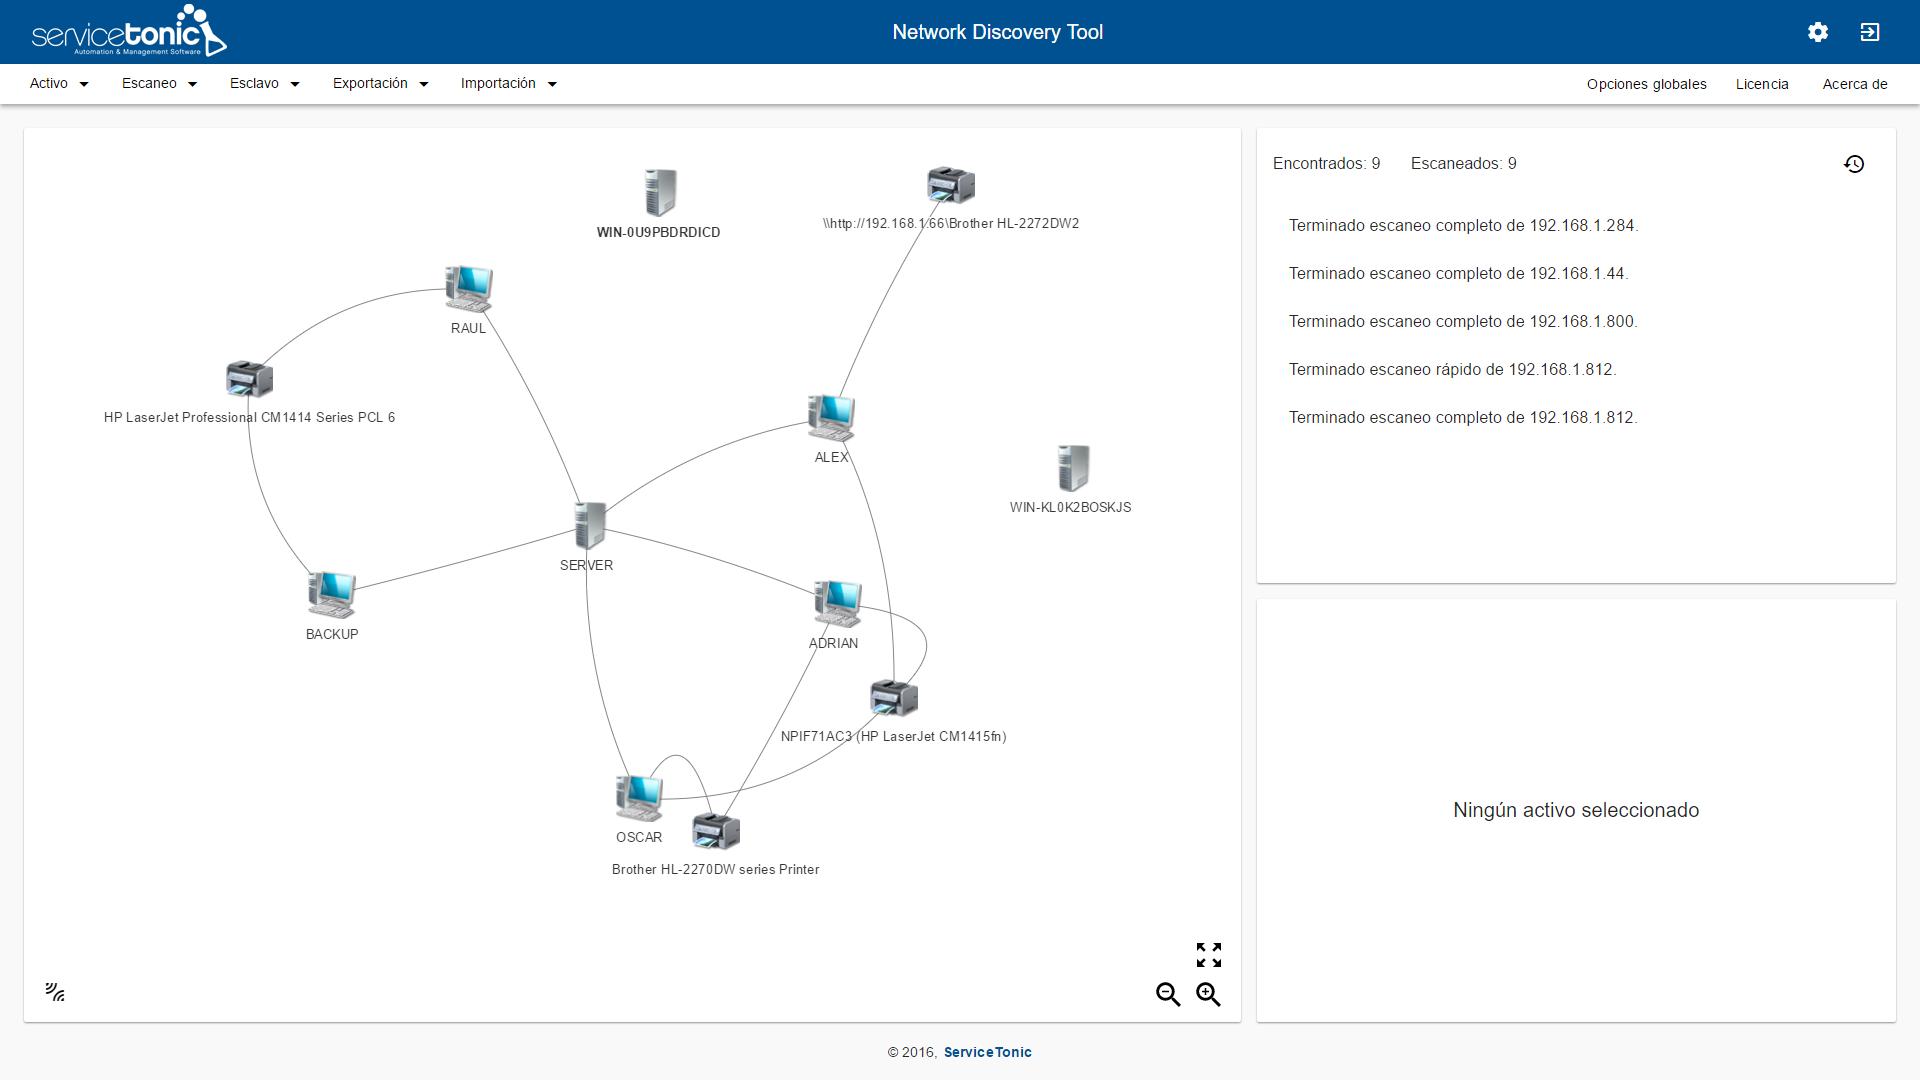 Network Discovery Tool: Visualización Gráfica